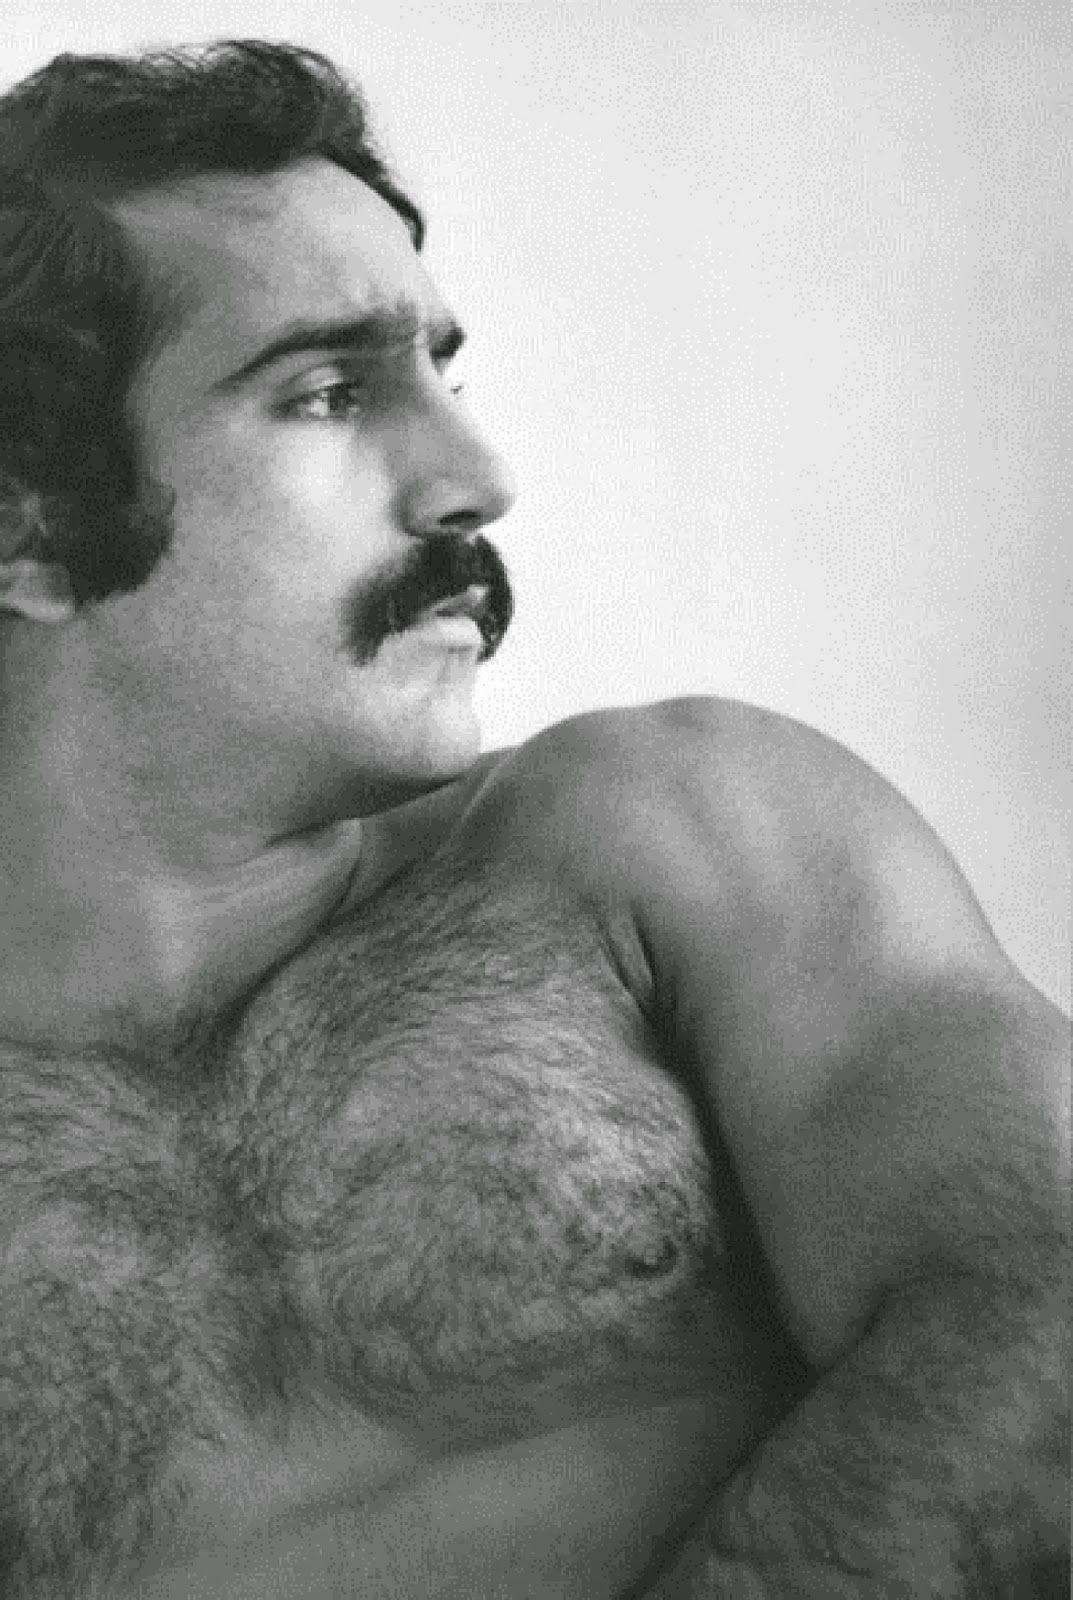 Bruno Vintage Gay Porn Stars - unknown vintage porn star